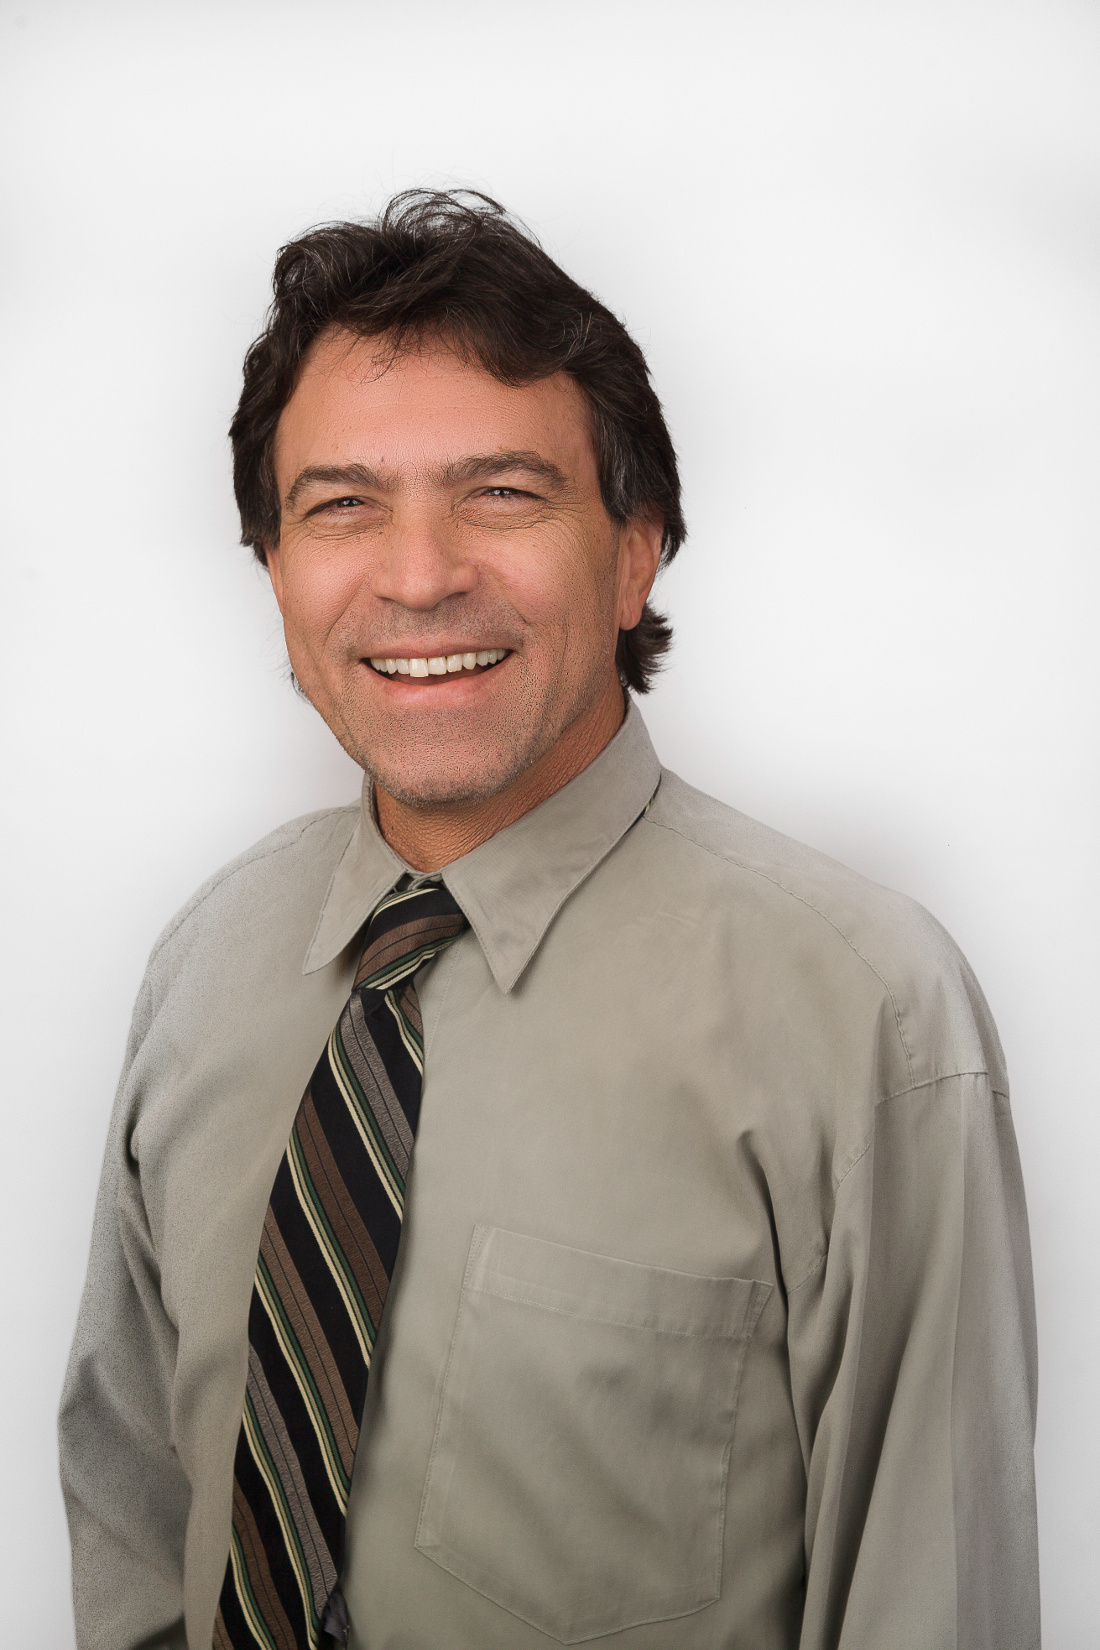 Roger Ansari